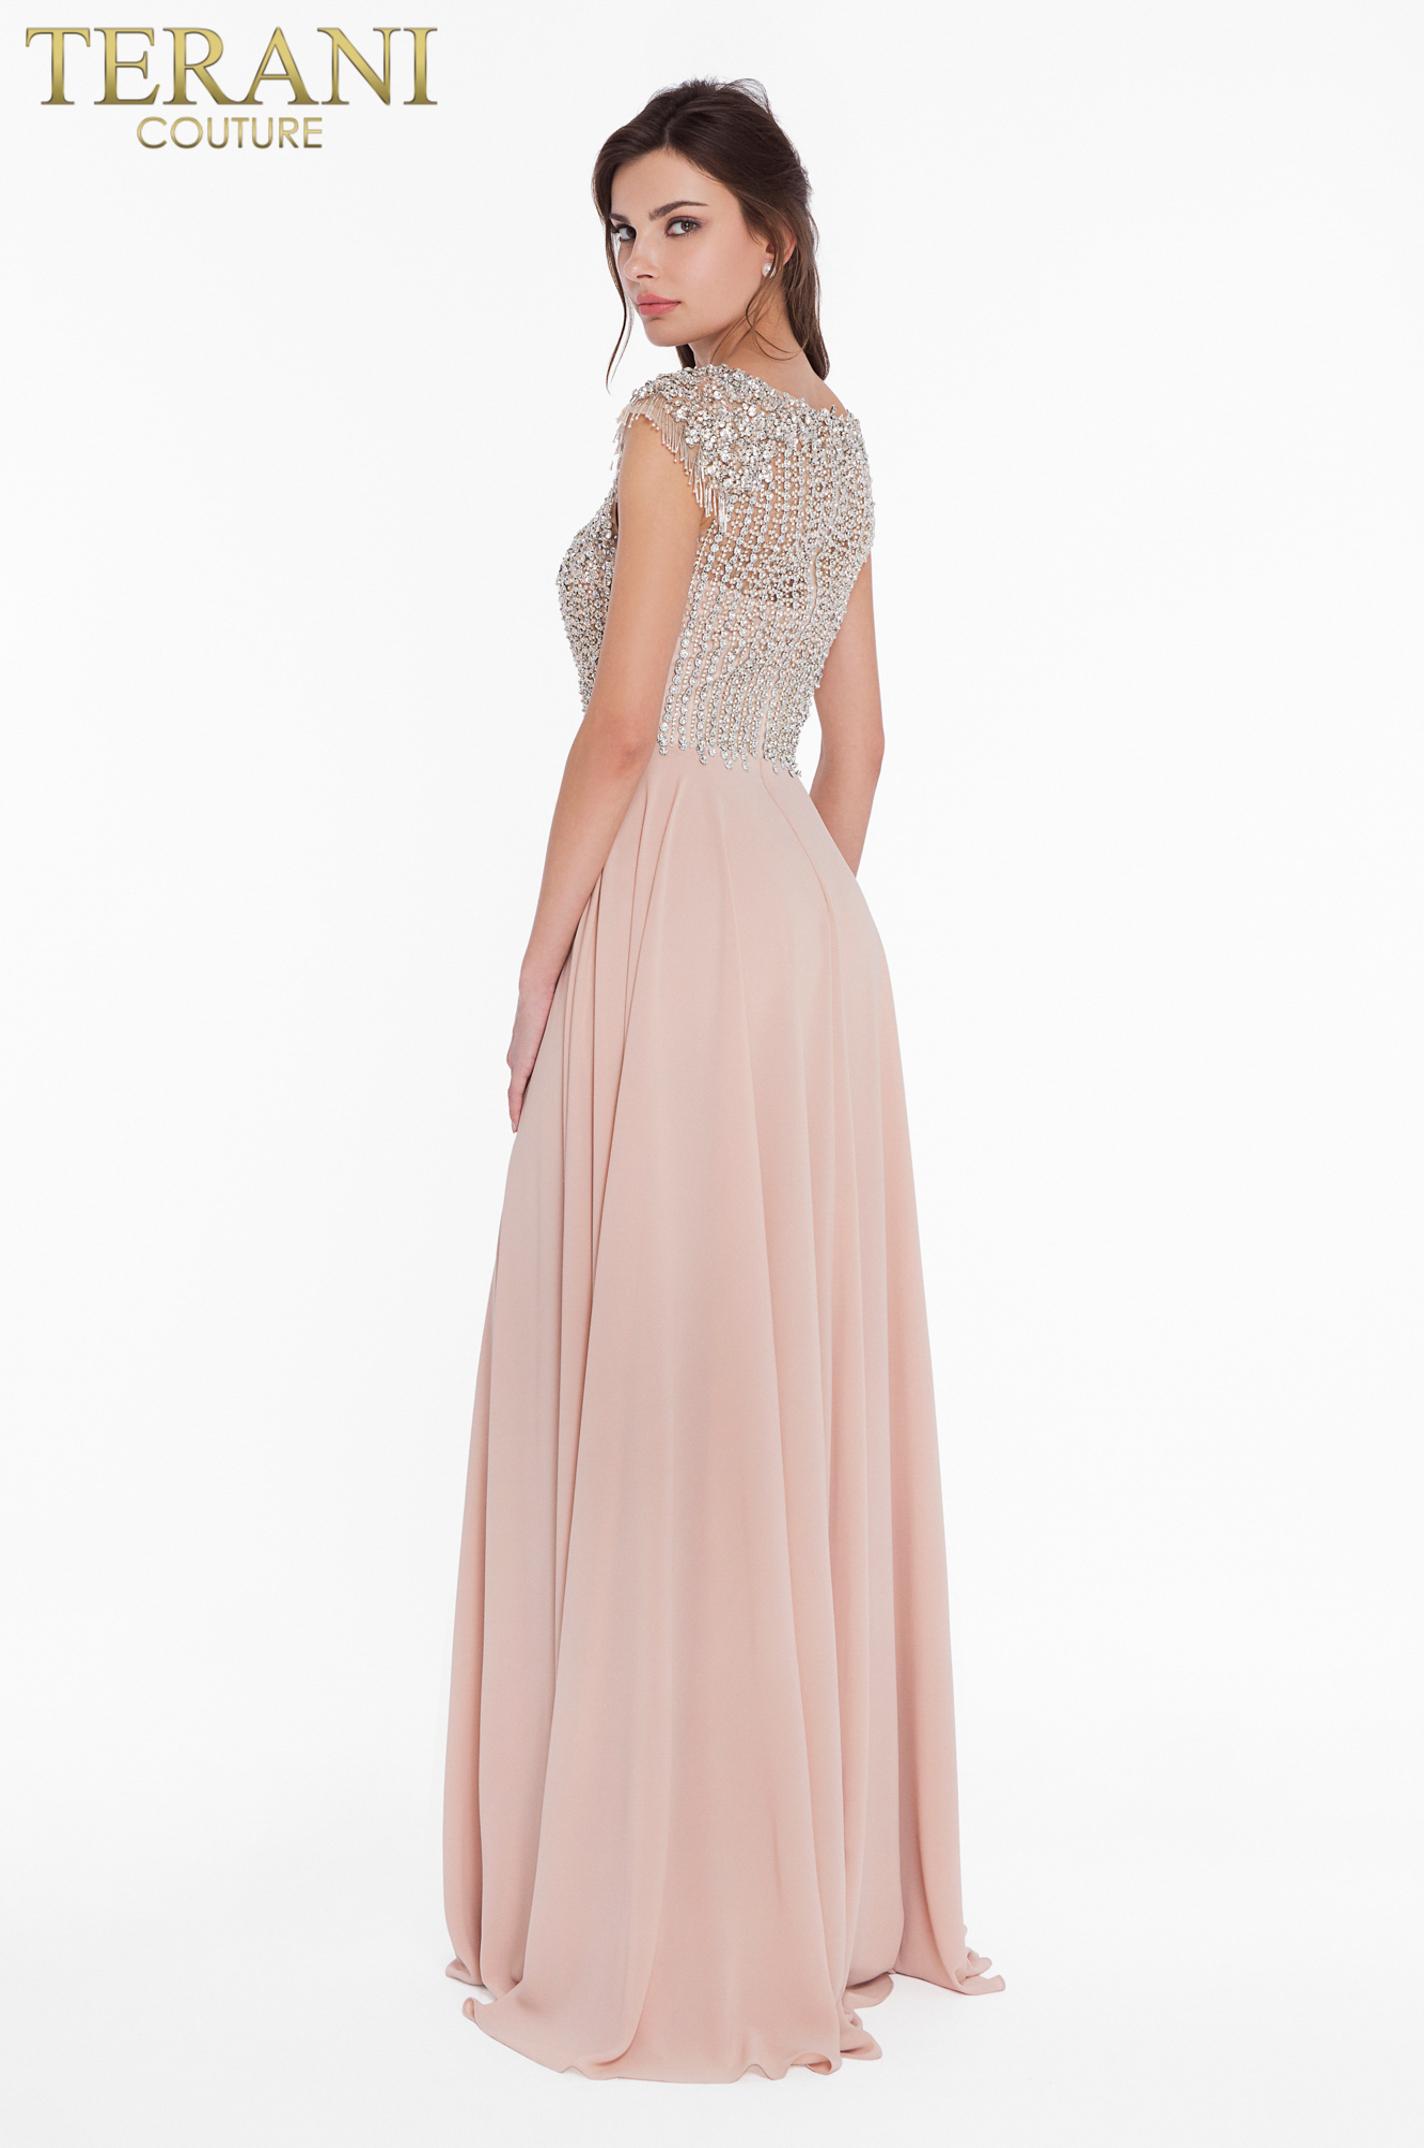 progines-sukneles-terani-couture-1822M7658-2